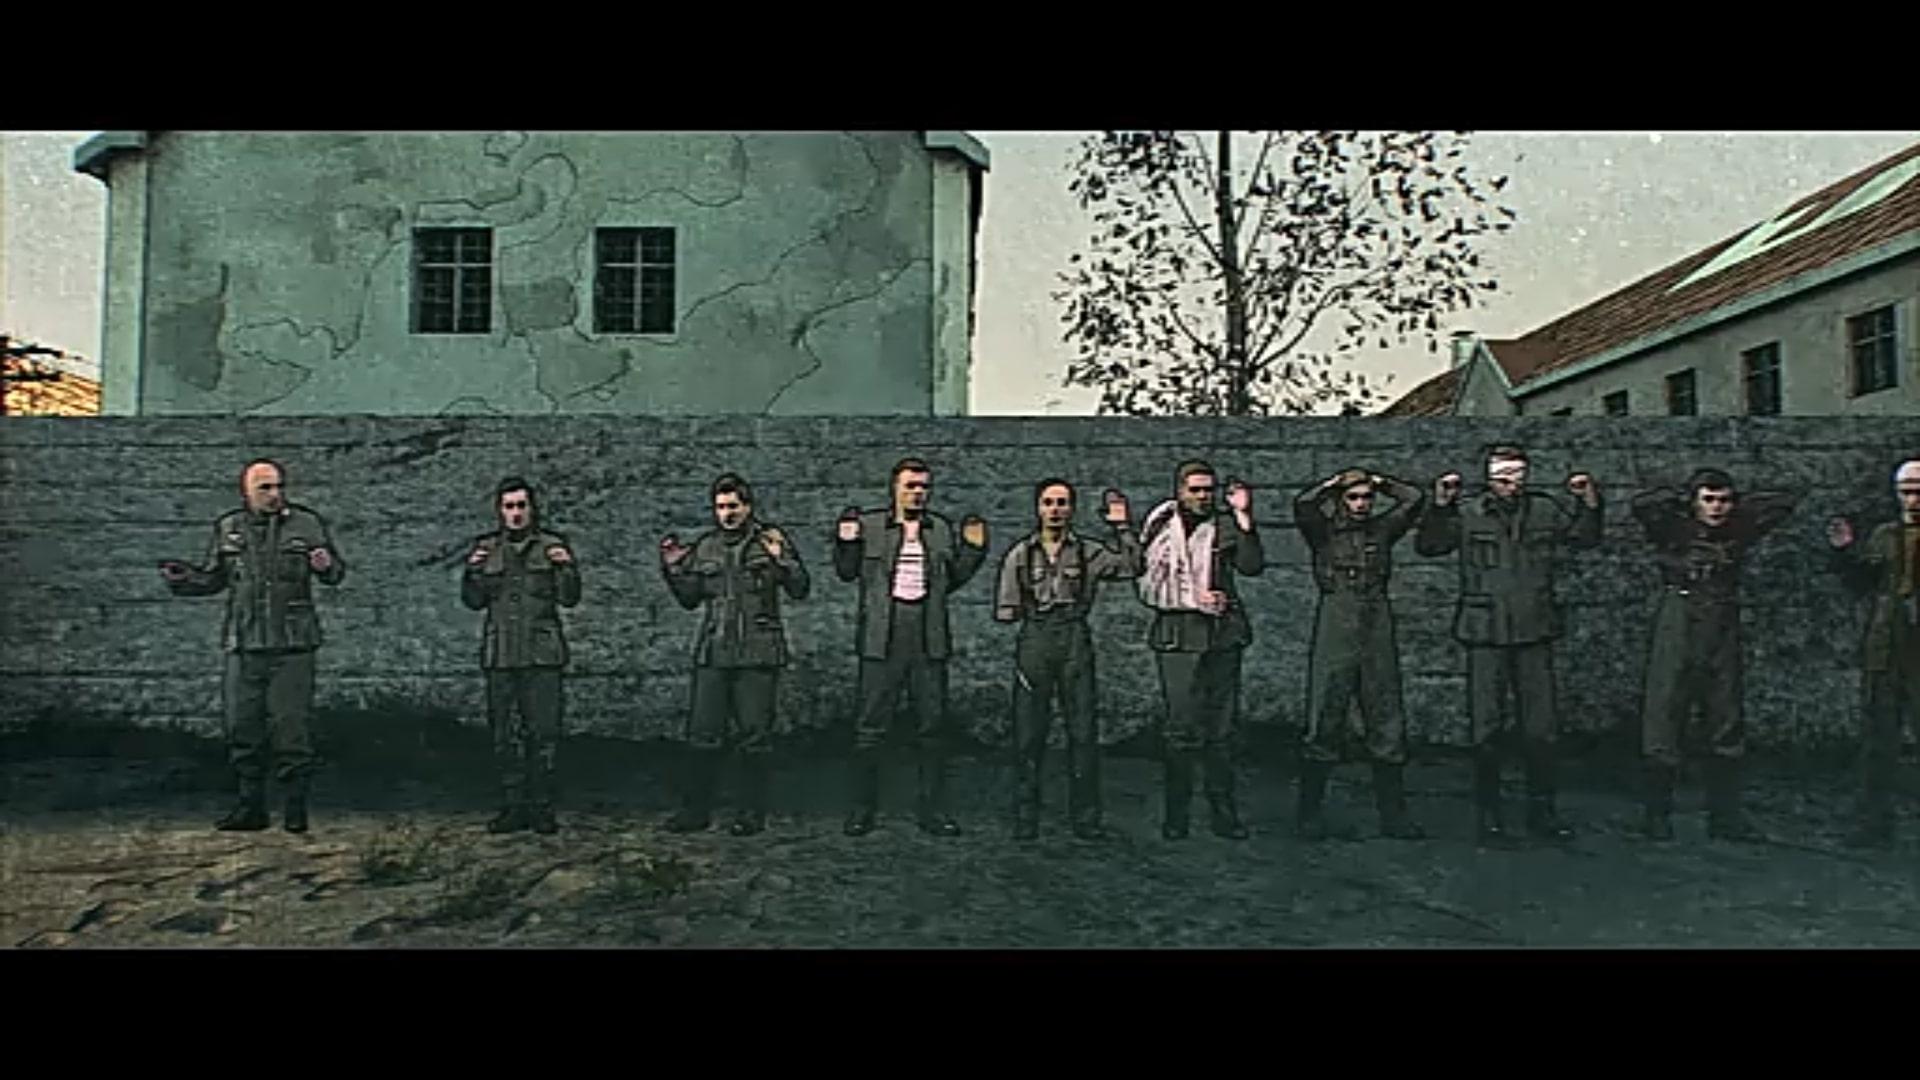 El final del Libertador, explicado   Sinopsis de la trama de Netflix 3